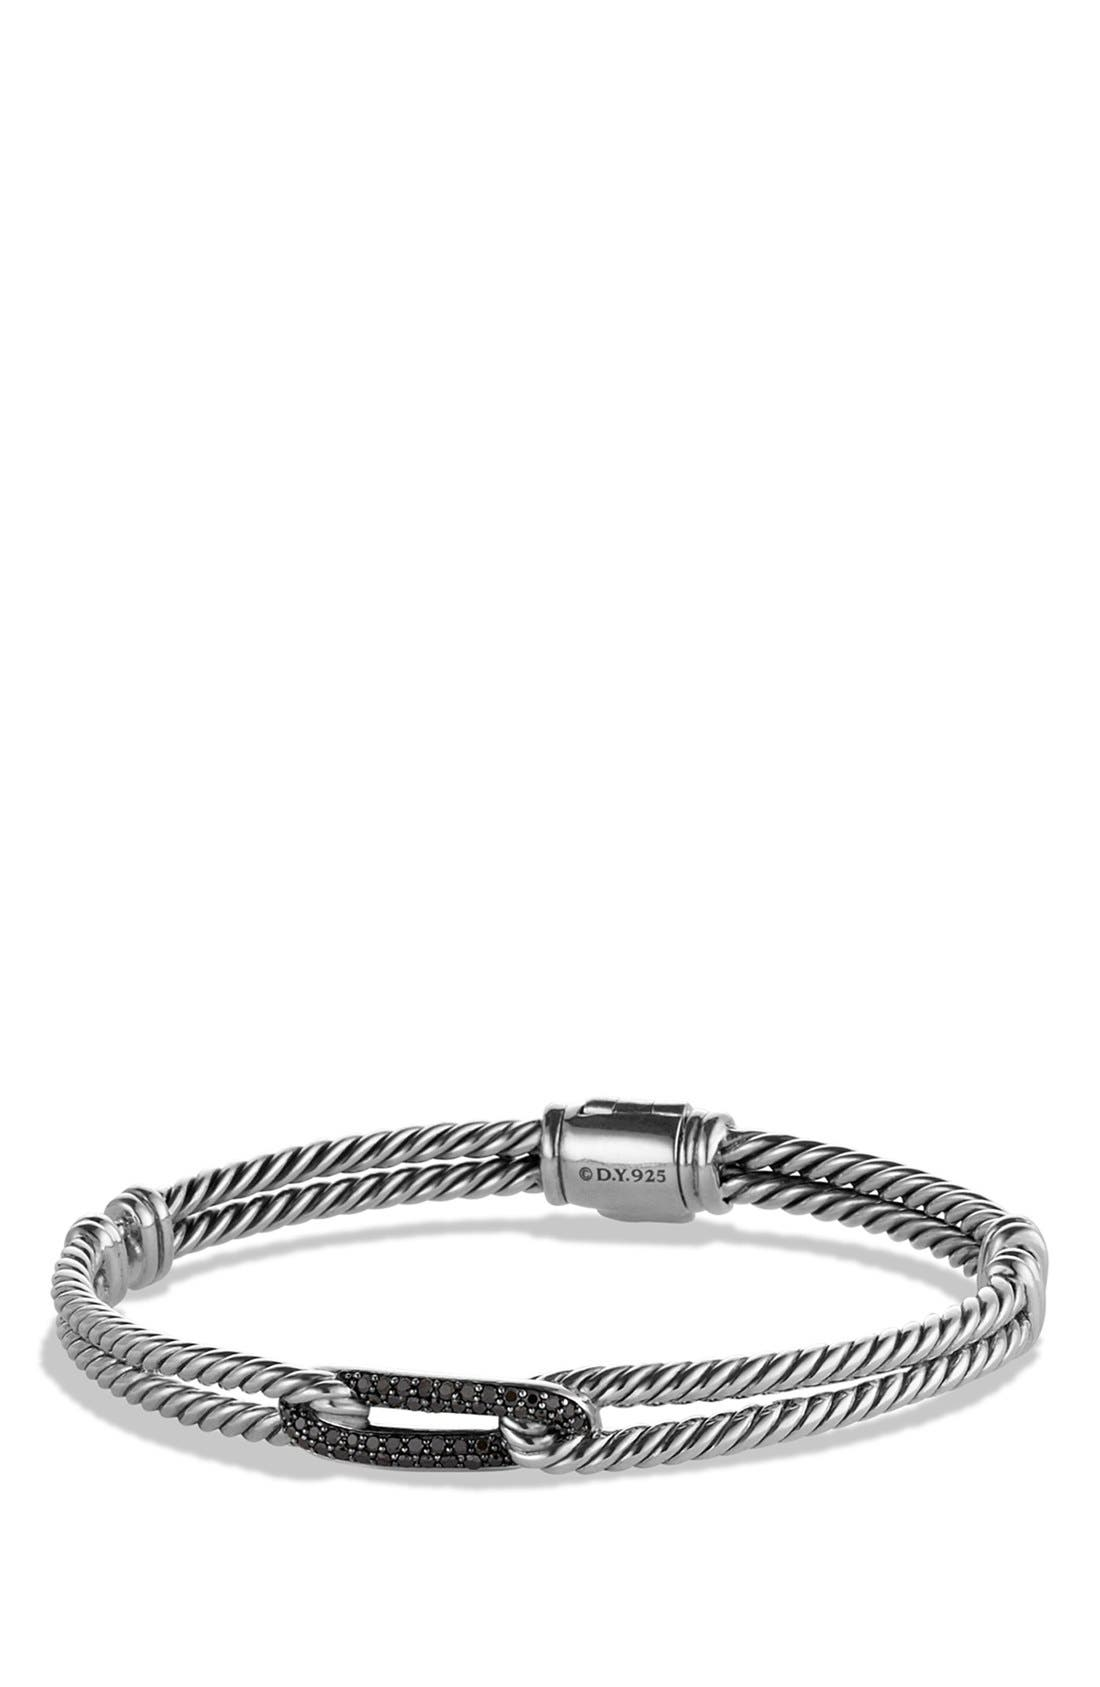 Alternate Image 1 Selected - David Yurman Petite Pavé 'Labyrinth' Mini Single Loop Bracelet with Diamonds in Gold